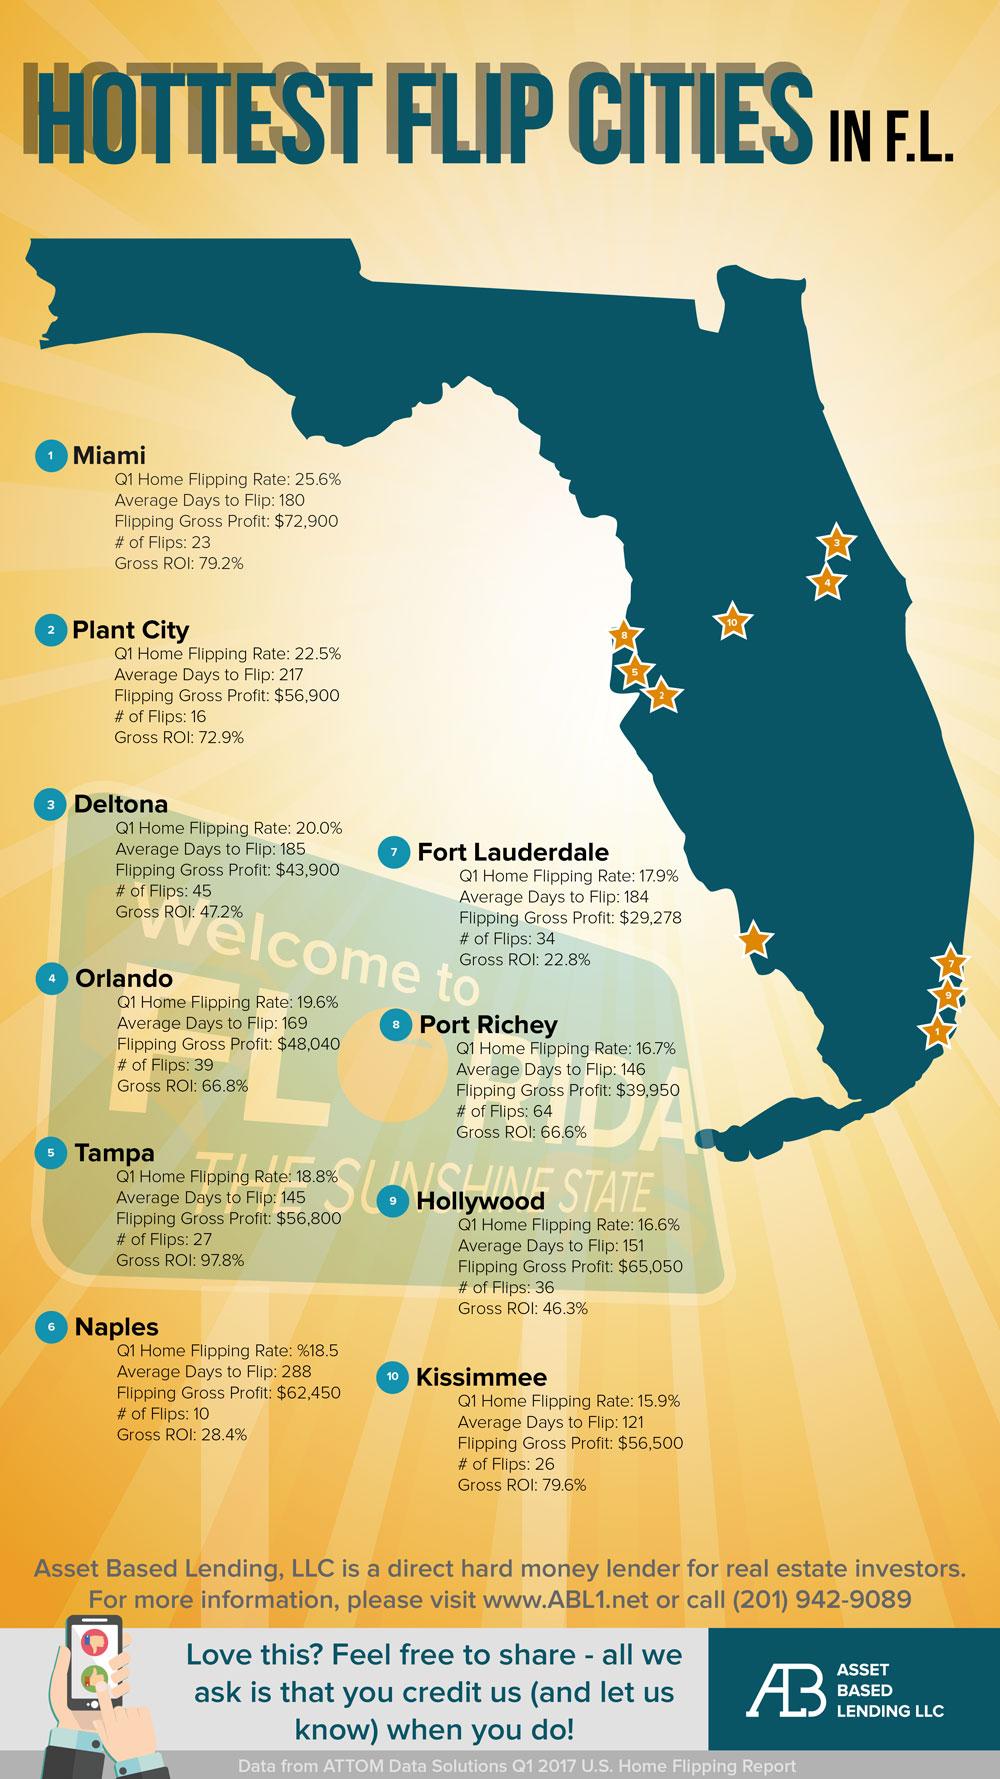 Top fix and flip cities in Florida